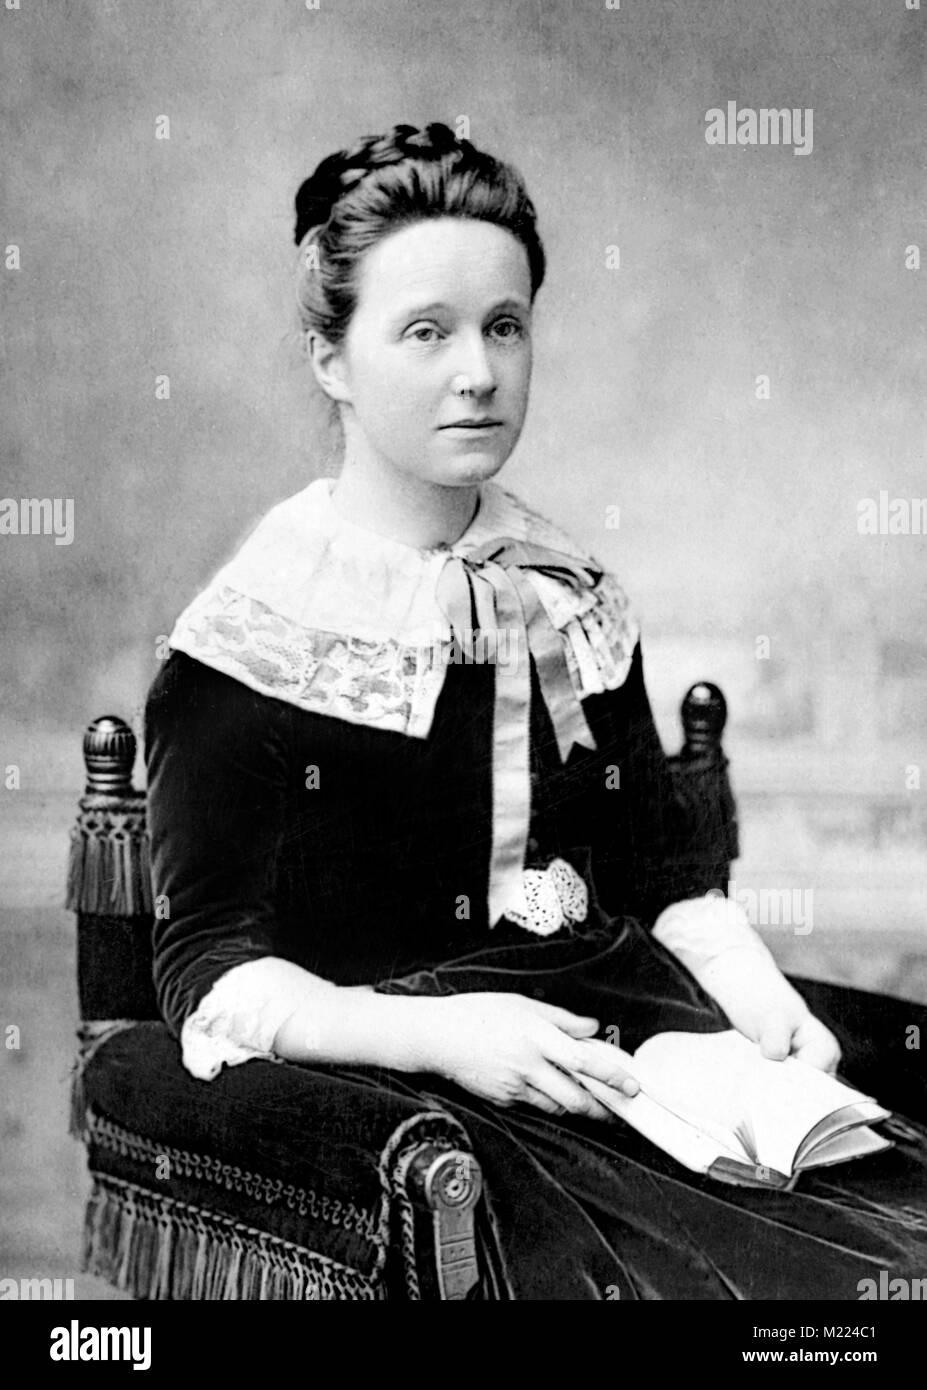 Millicent Fawcett. Portrait of the British suffragist, Dame Millicent Garrett Fawcett (1847-1929) - Stock Image